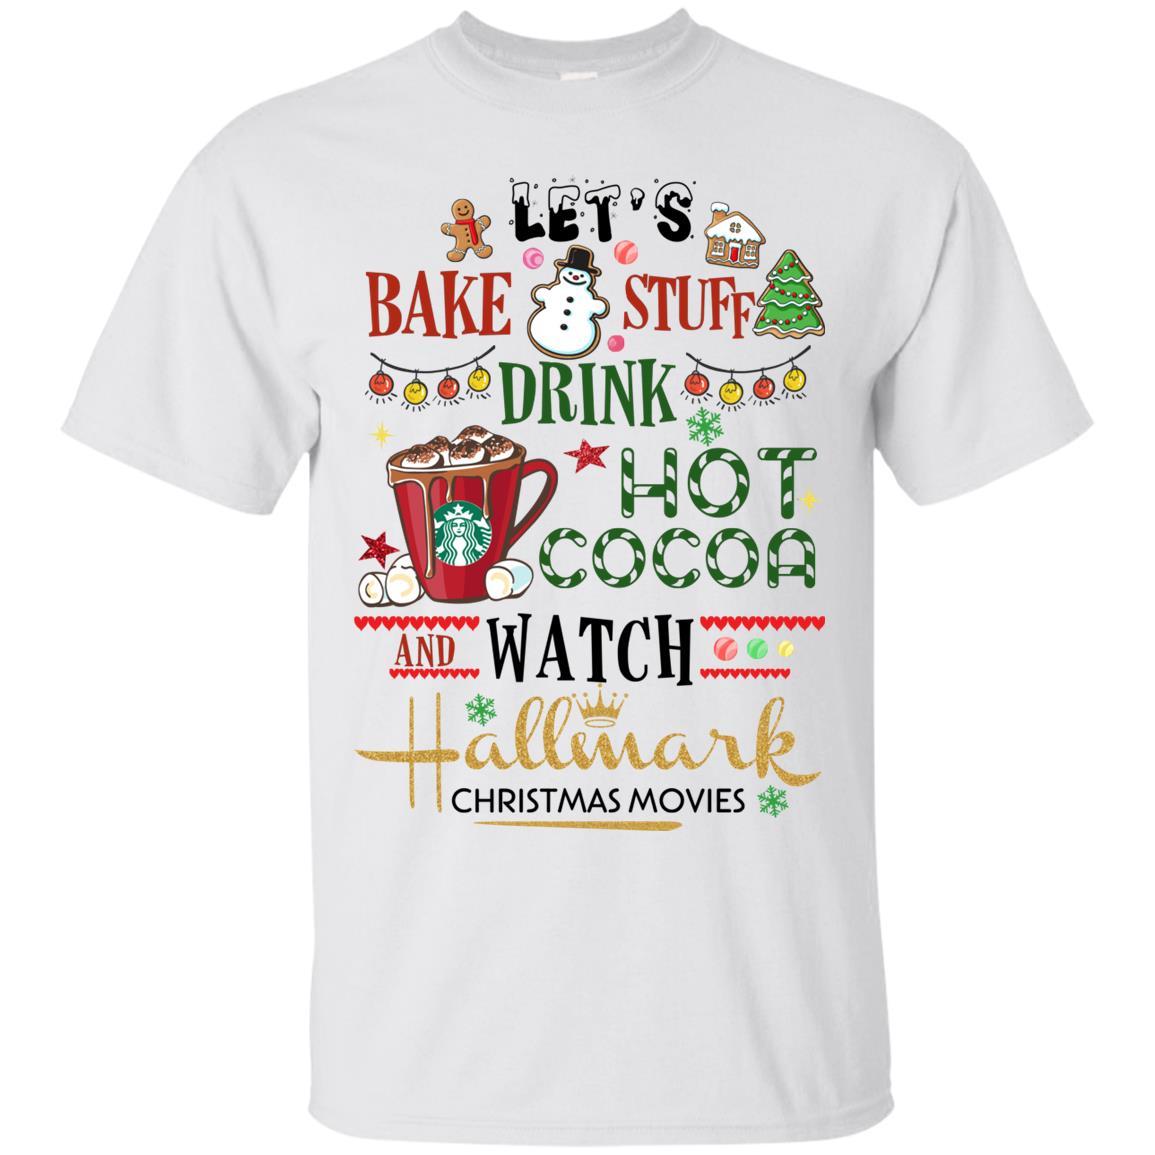 Hallmark Christmas Shirt Svg.Let S Bake Stuff Drink Hot Cocoa And Watch Hallmark Christmas Movies T Shirt Sweatshirt